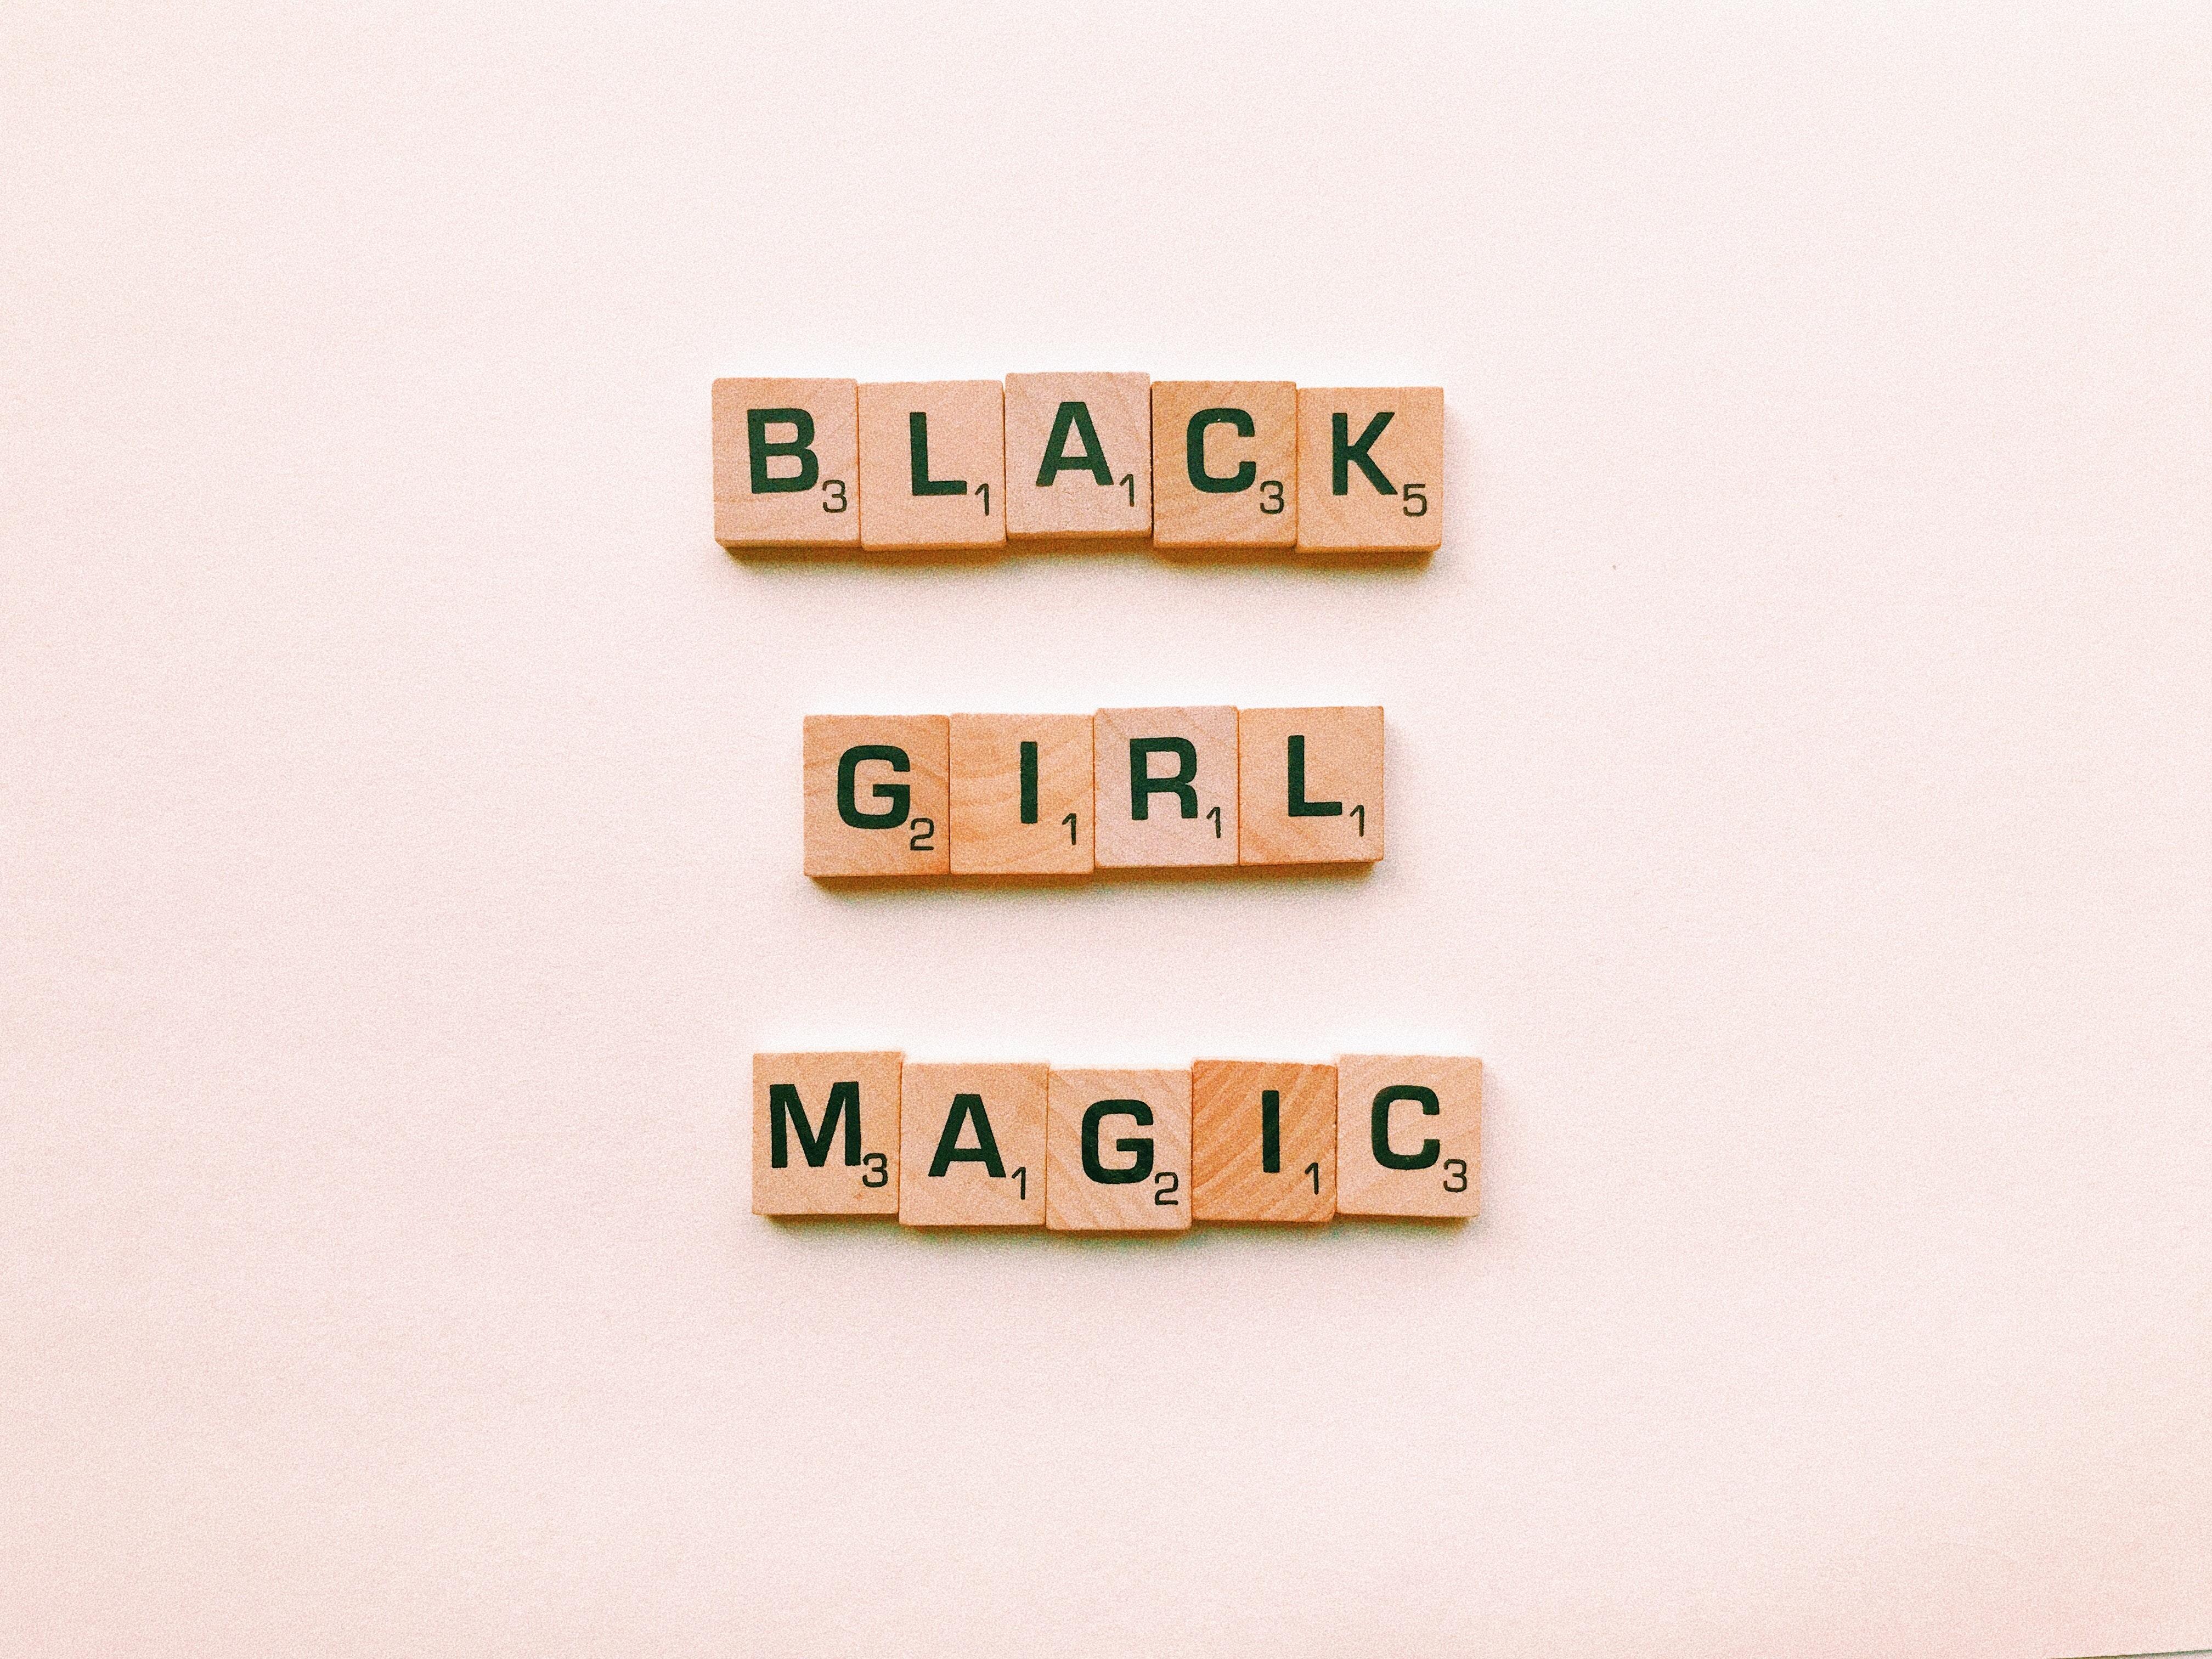 Free Images : alphabet, Black Girl Magic, conceptual, creativity